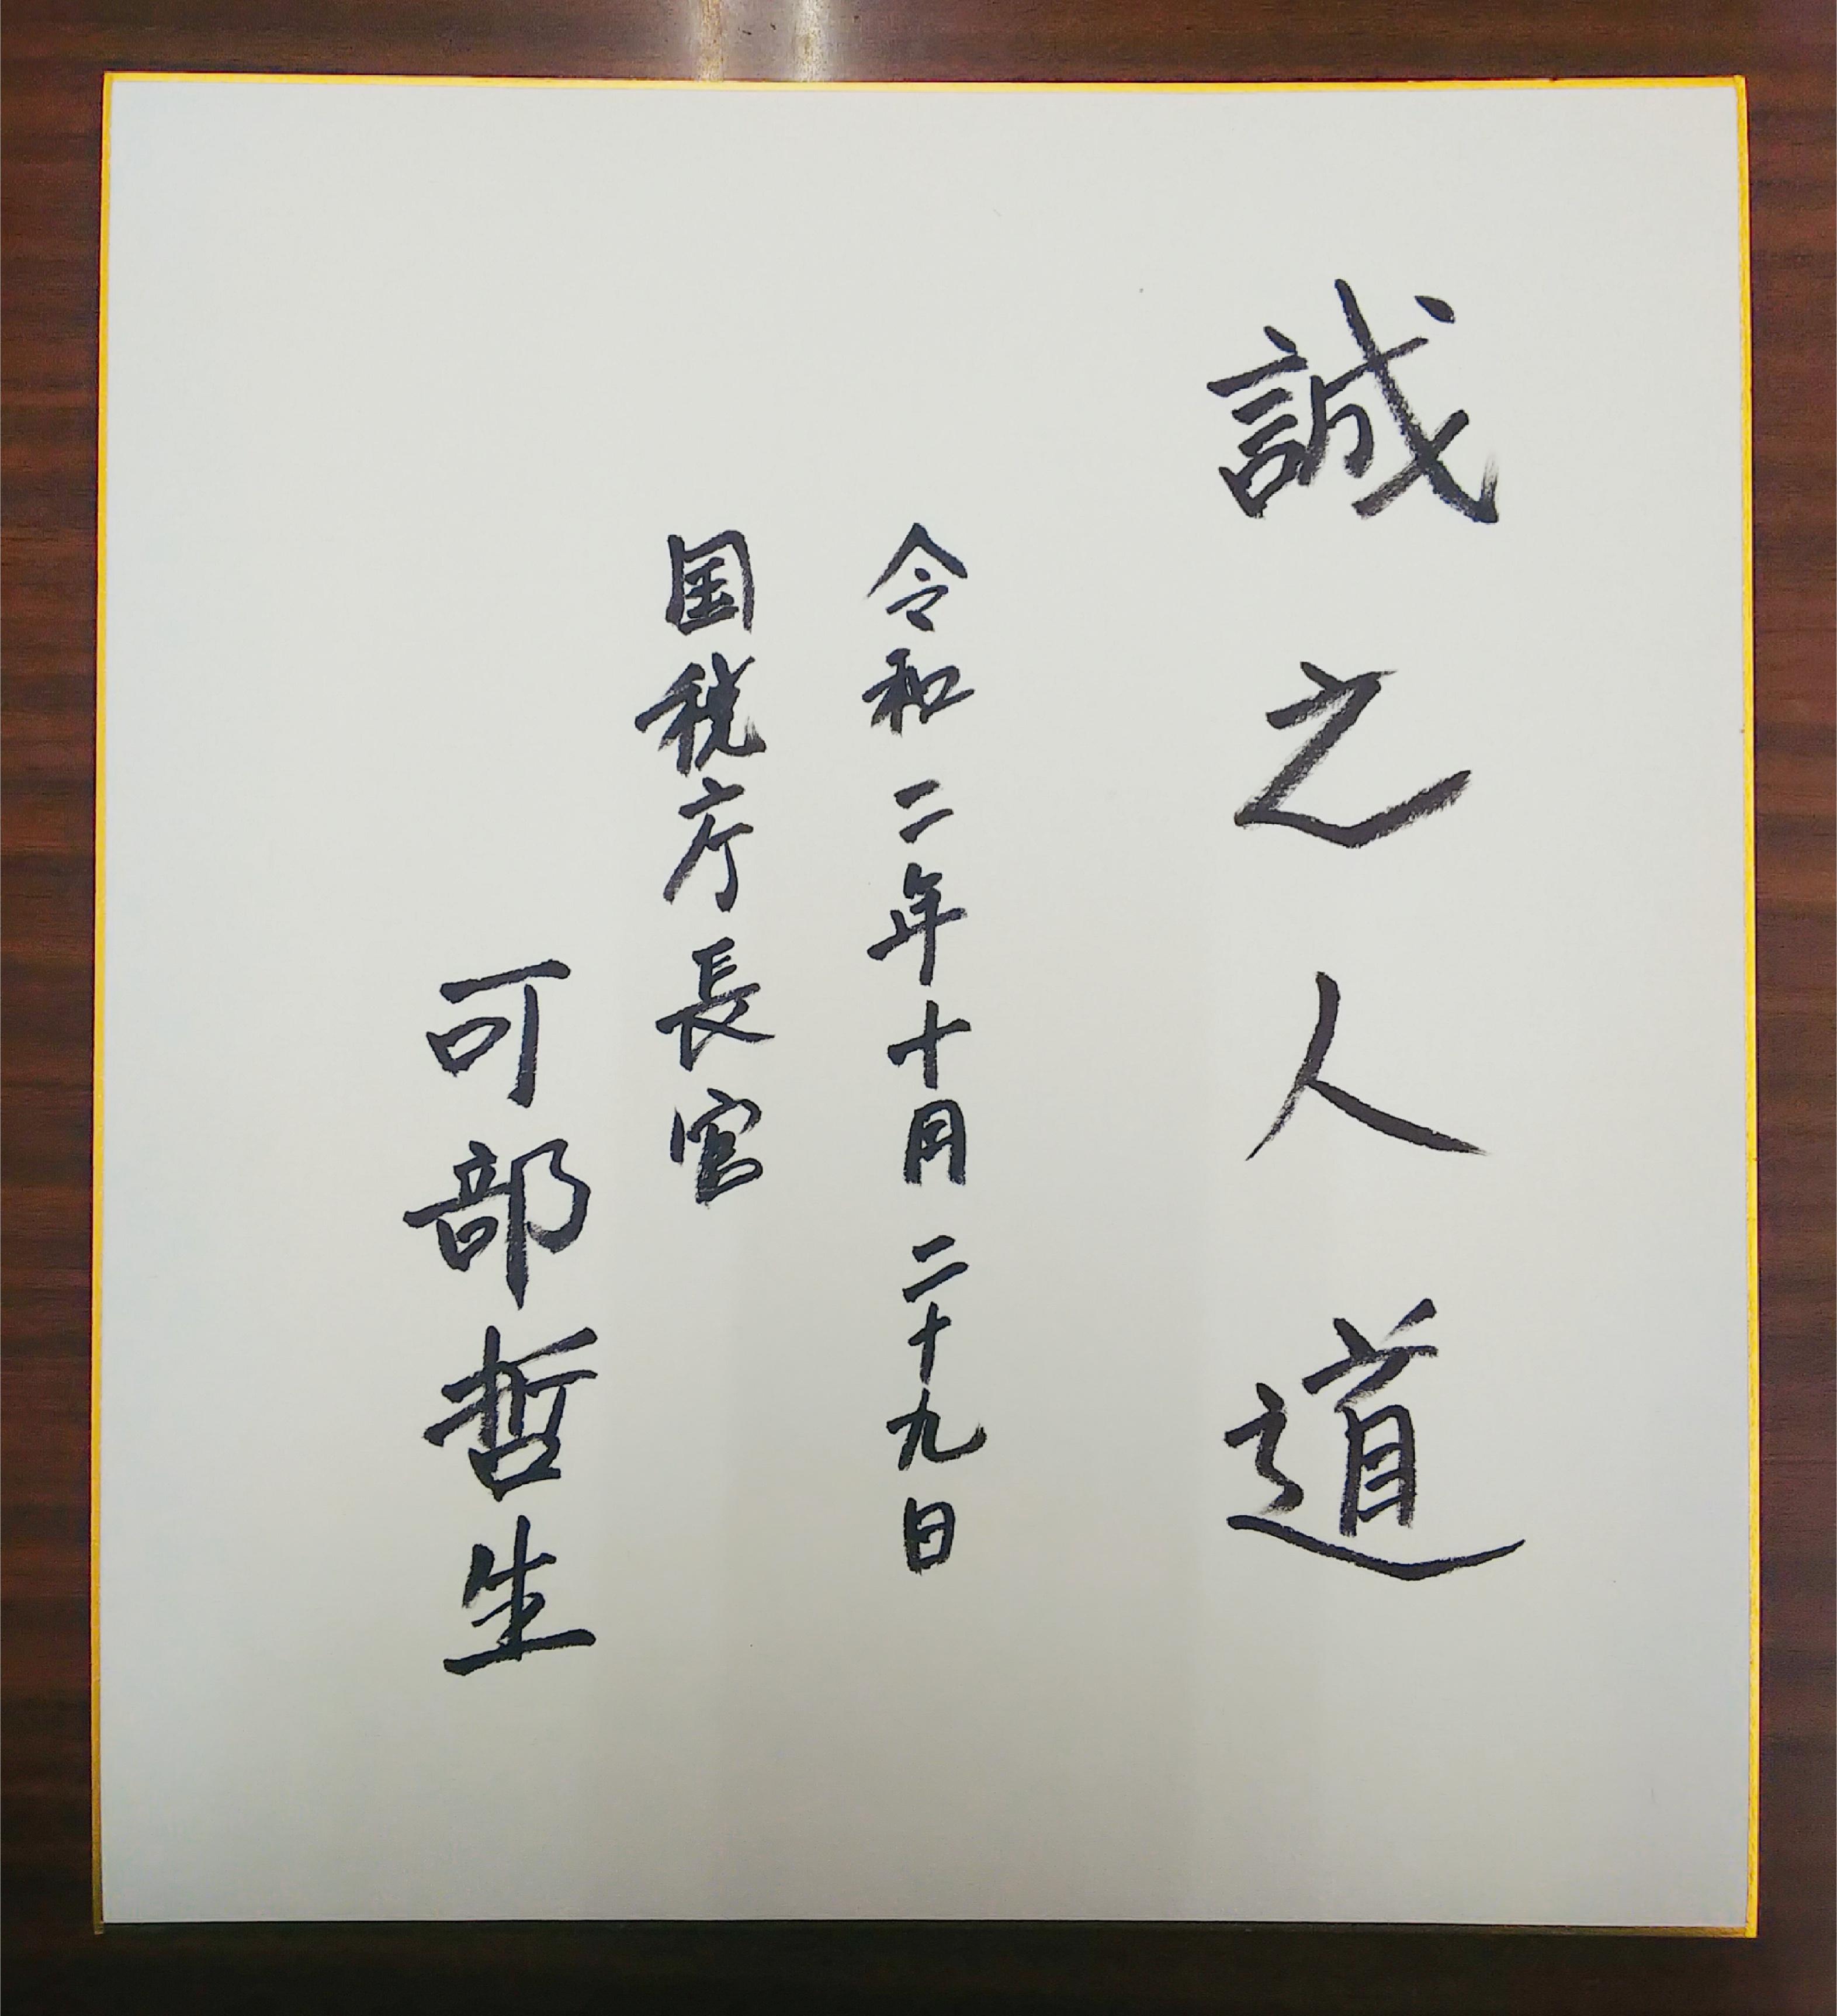 http://www.fukukomachi.com/blog/photo/C360_2020-10-29-15-01-43-600.jpg